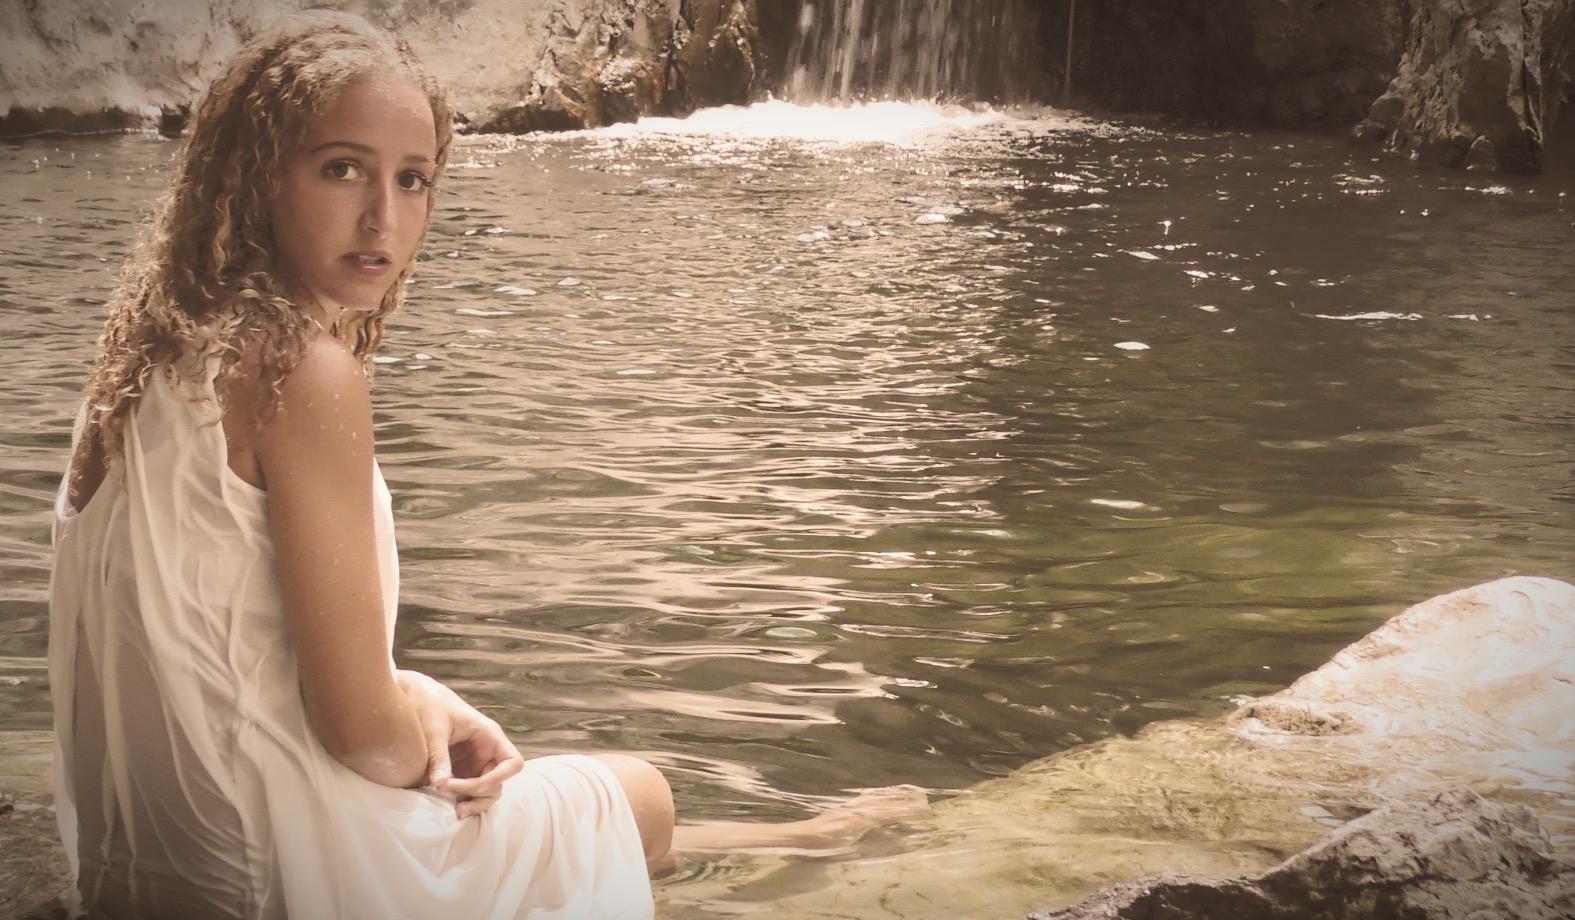 La riviere de Paradis_edited